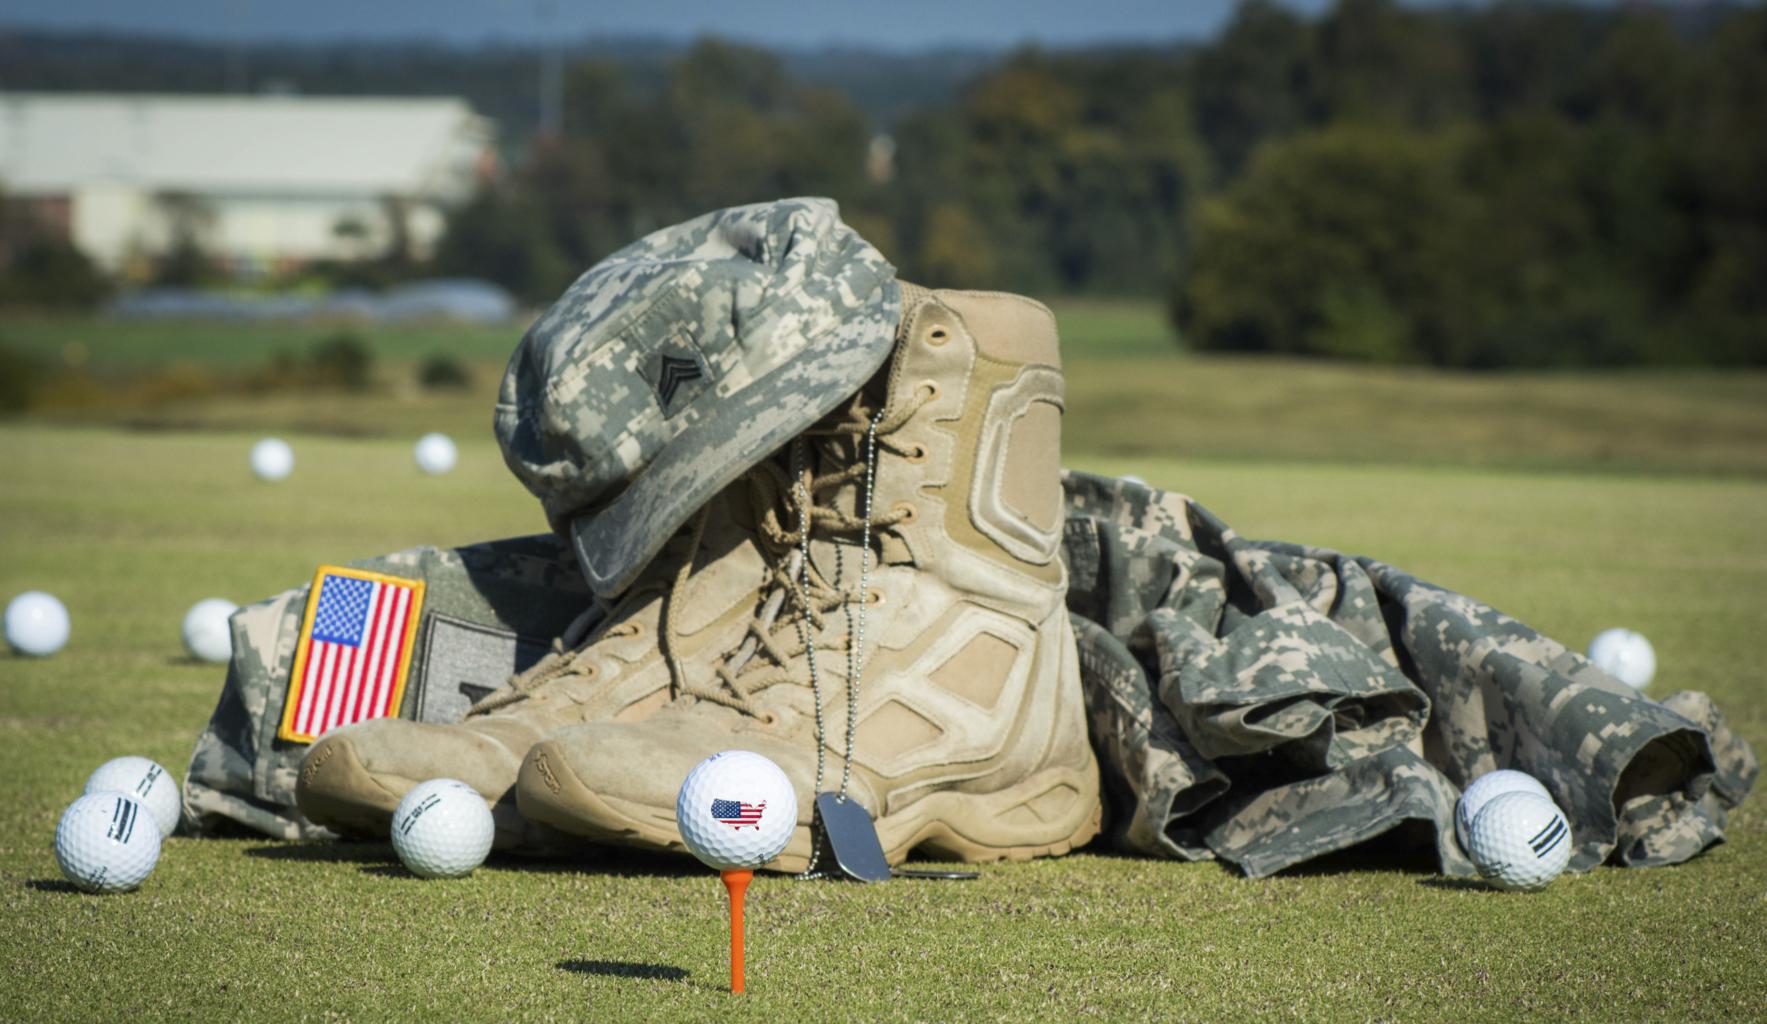 17th Annual Golf Classic image